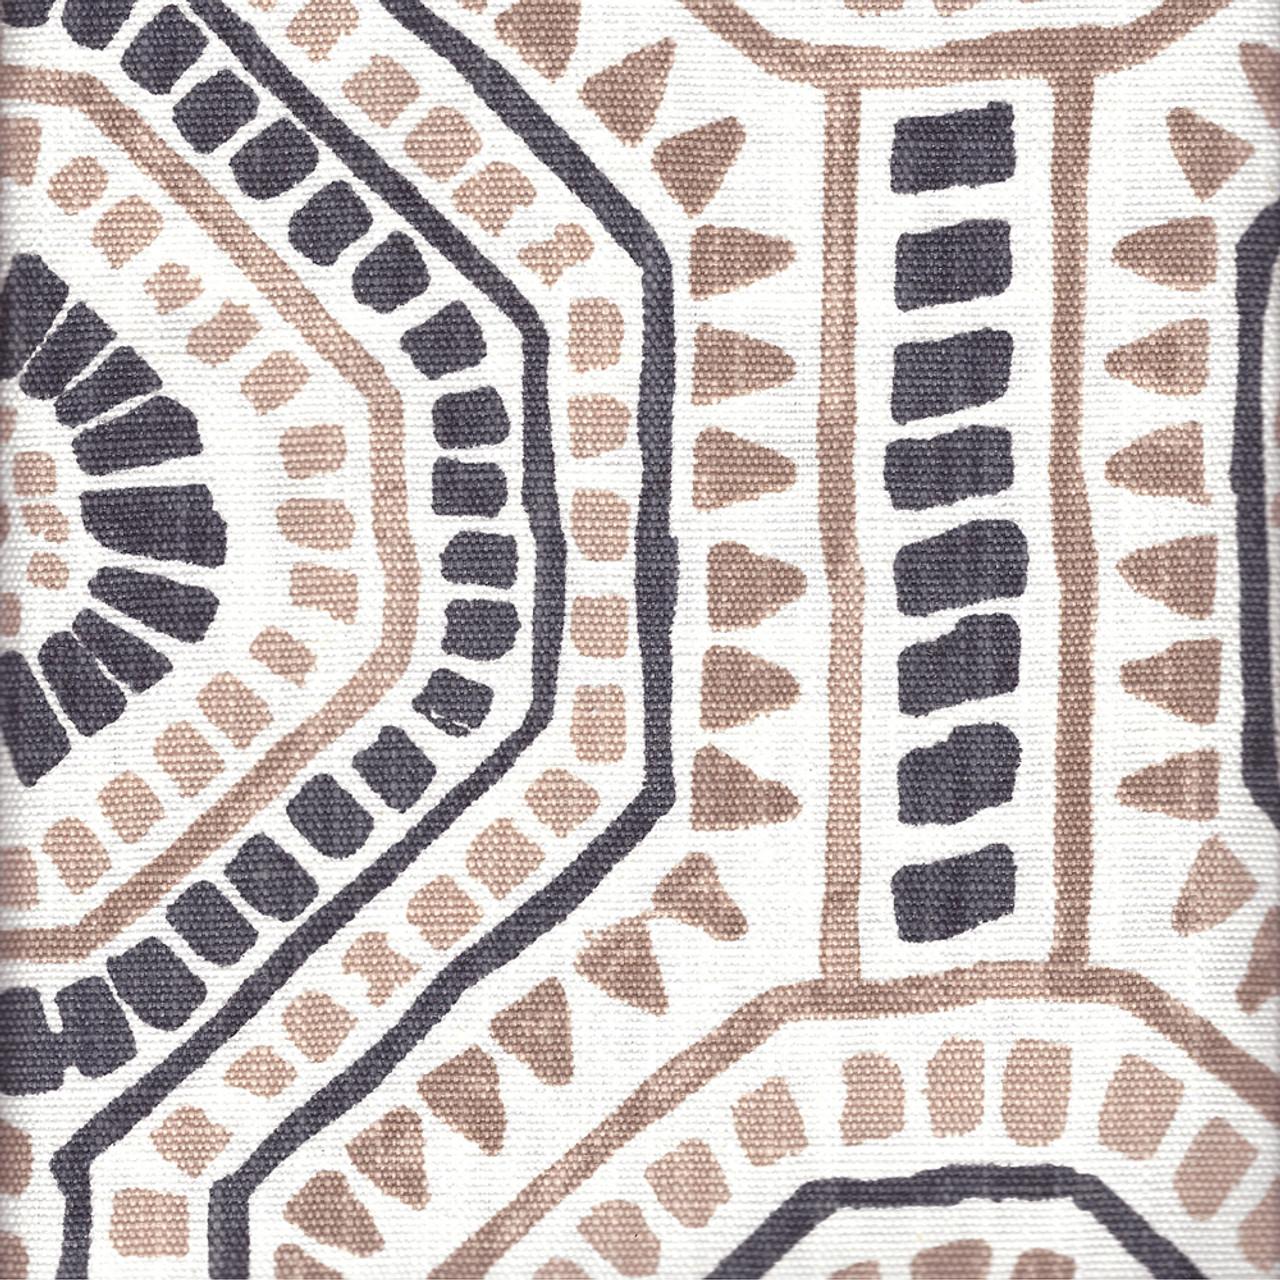 shower curtain in bricktown spice geometric rosy tan slub linen